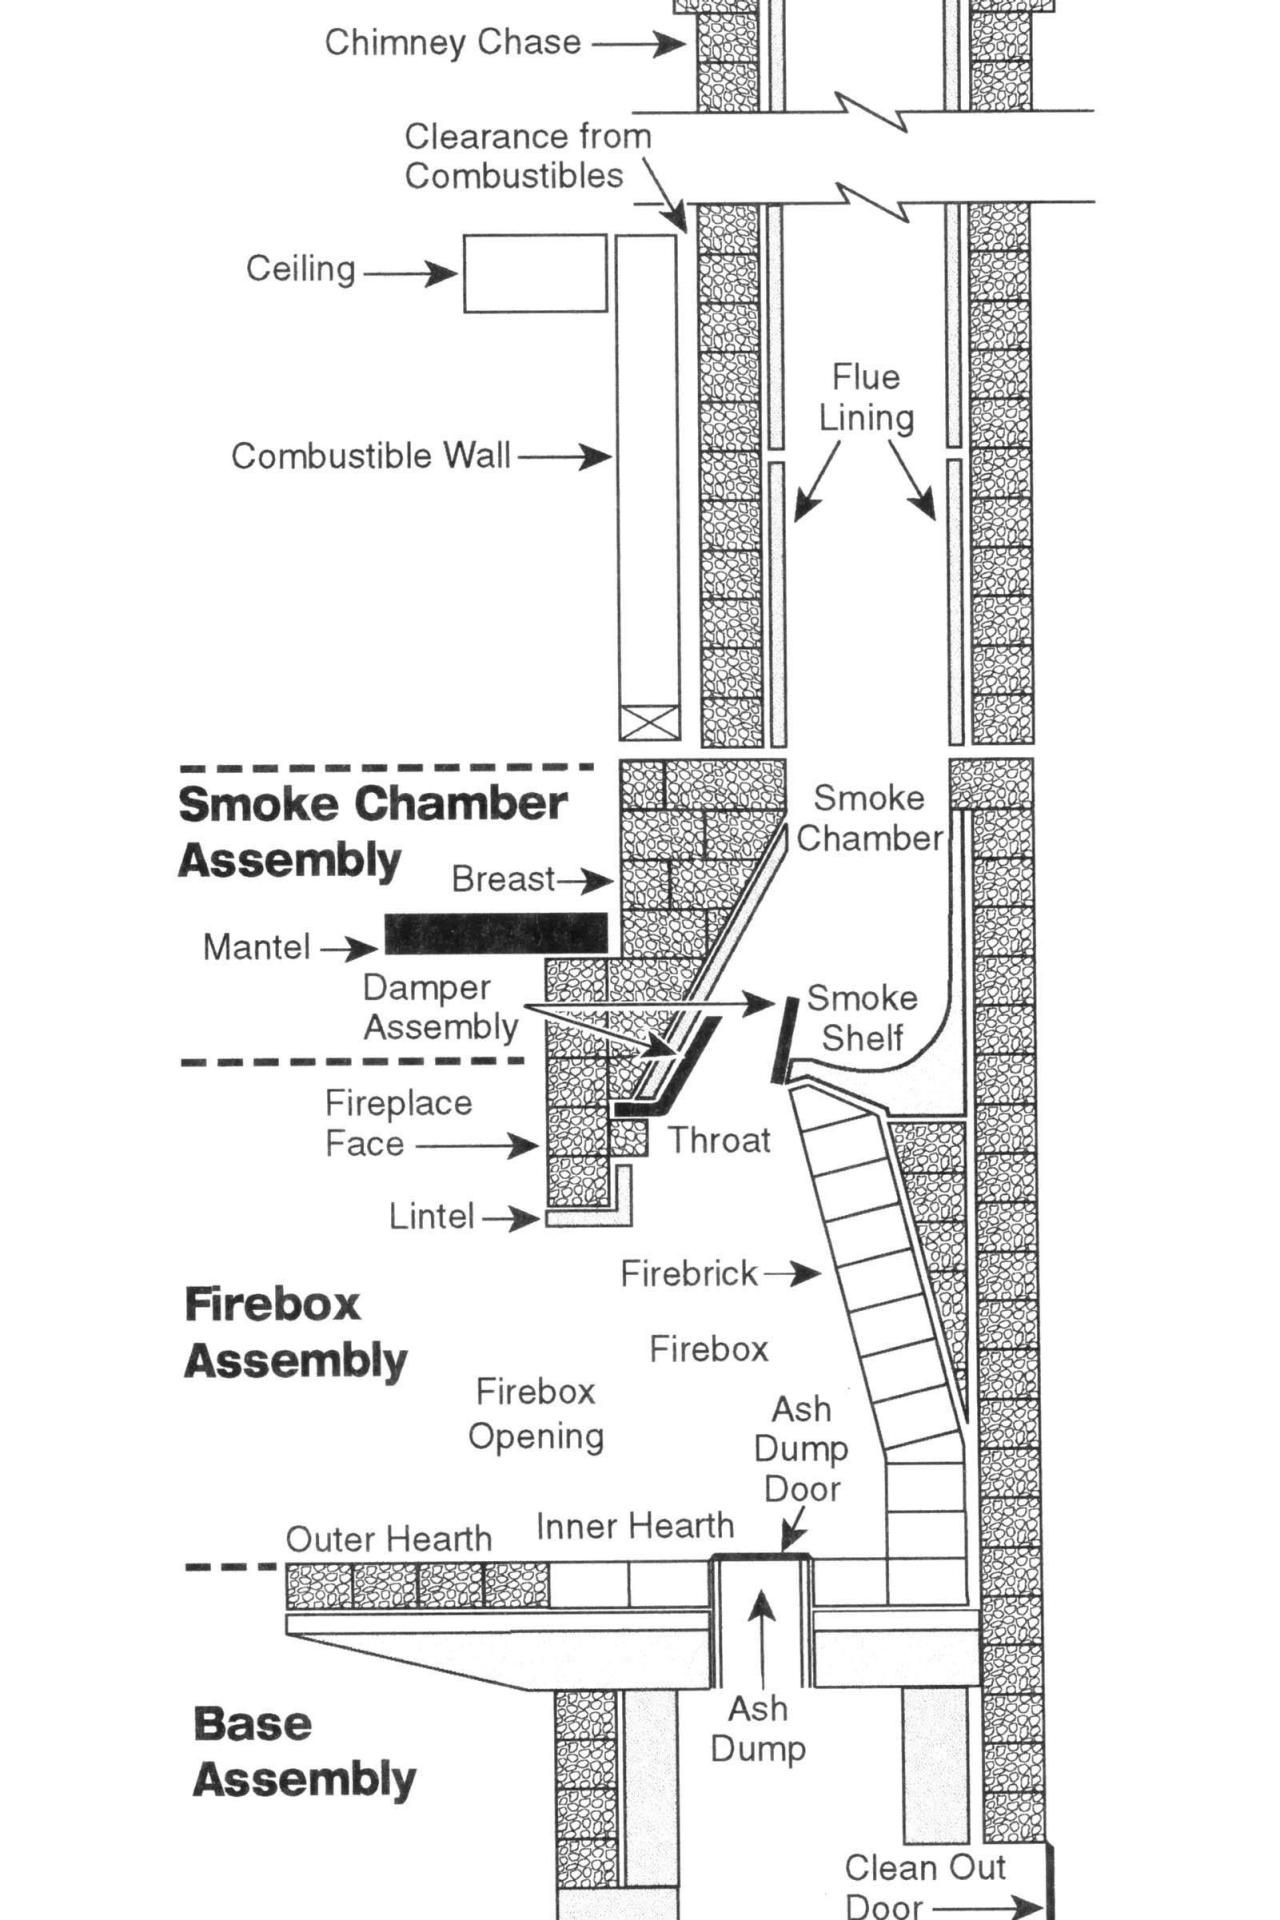 10 tips for maintaining a wood burning fireplace wood burning